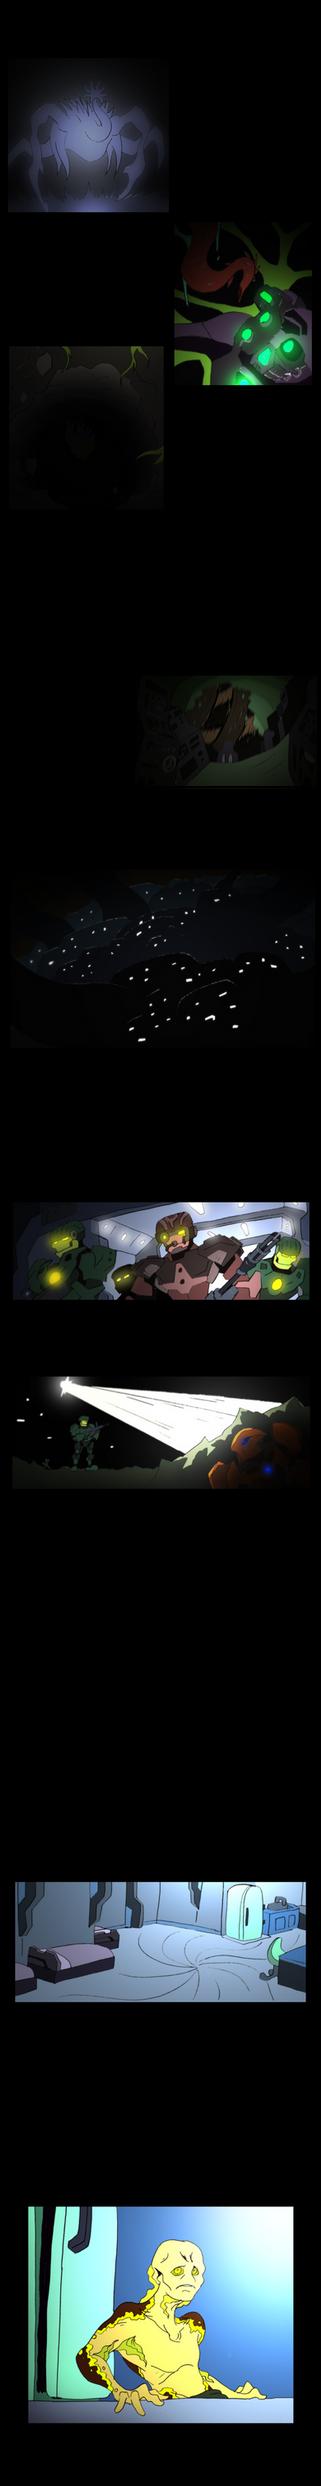 Bionicle- Nova Orbis- Mystery- Chapter 20